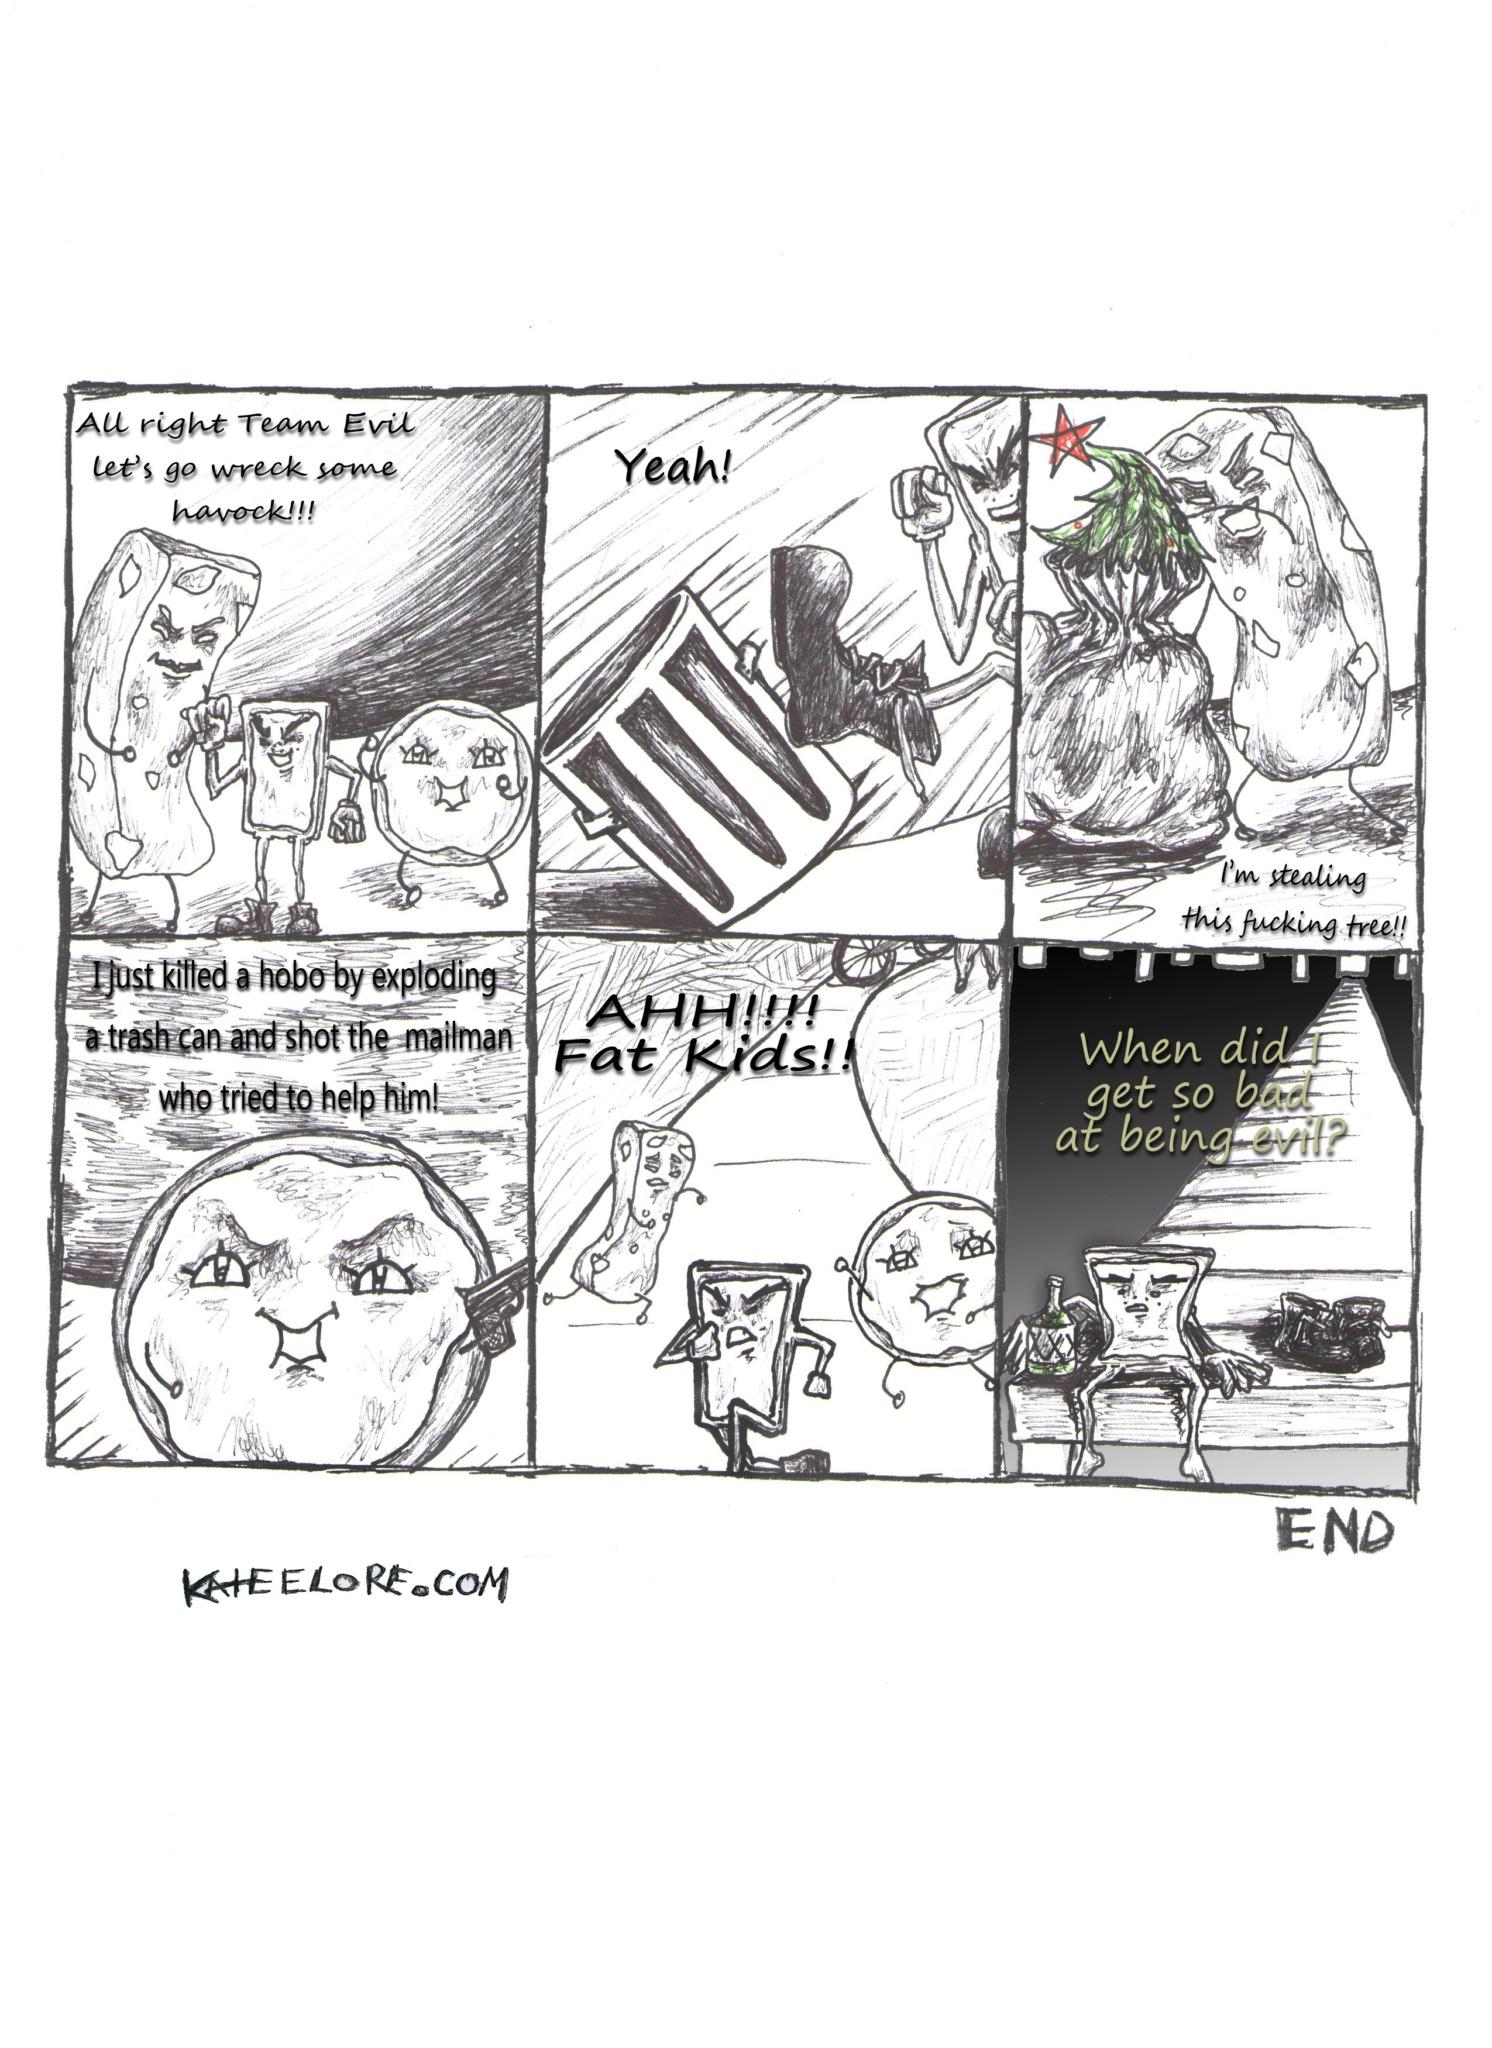 Melancholy Evil Poptart KateELore.com